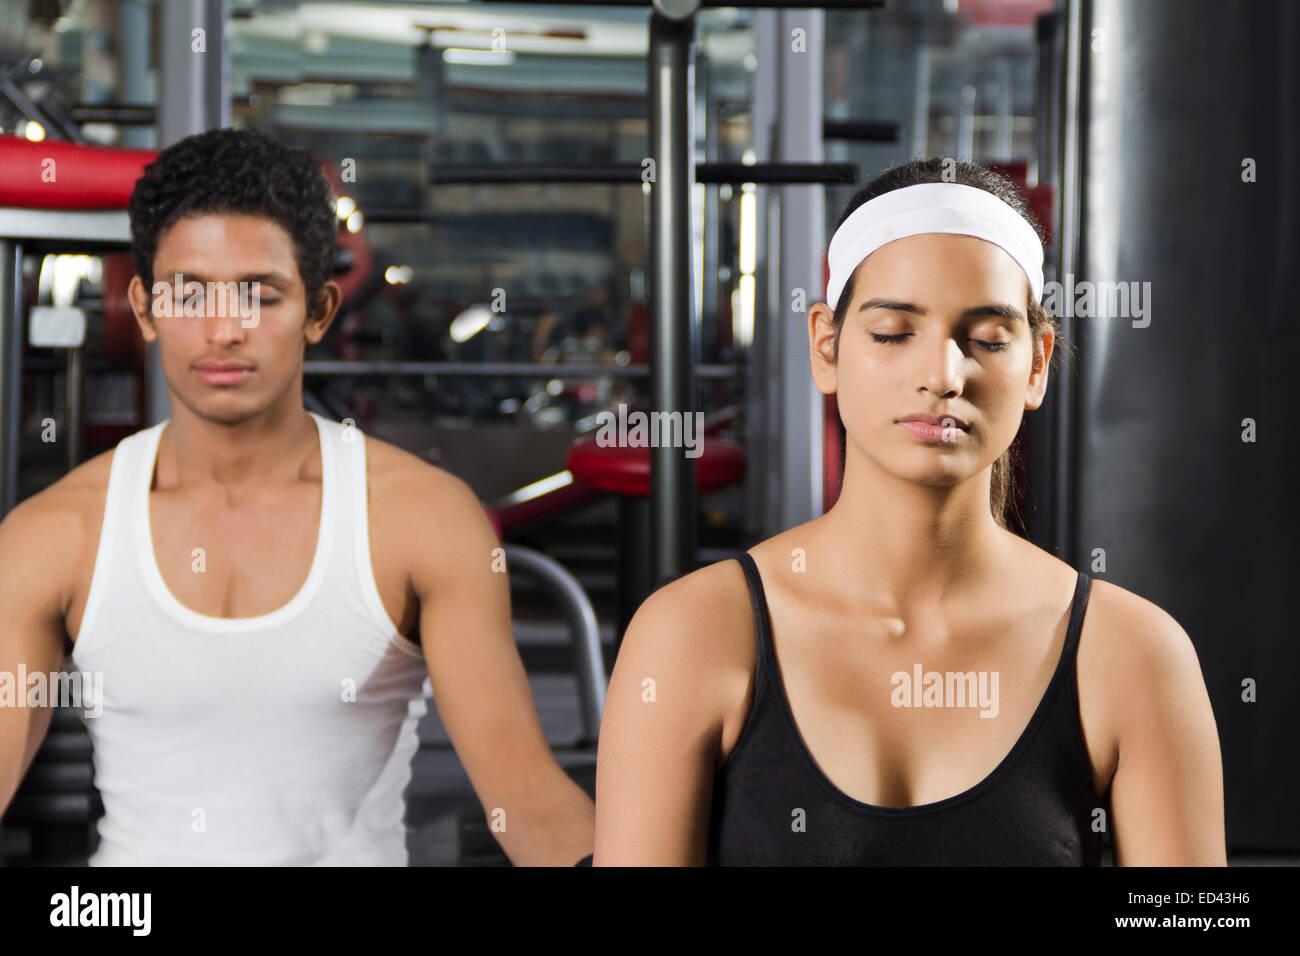 2 Indian Lady Man